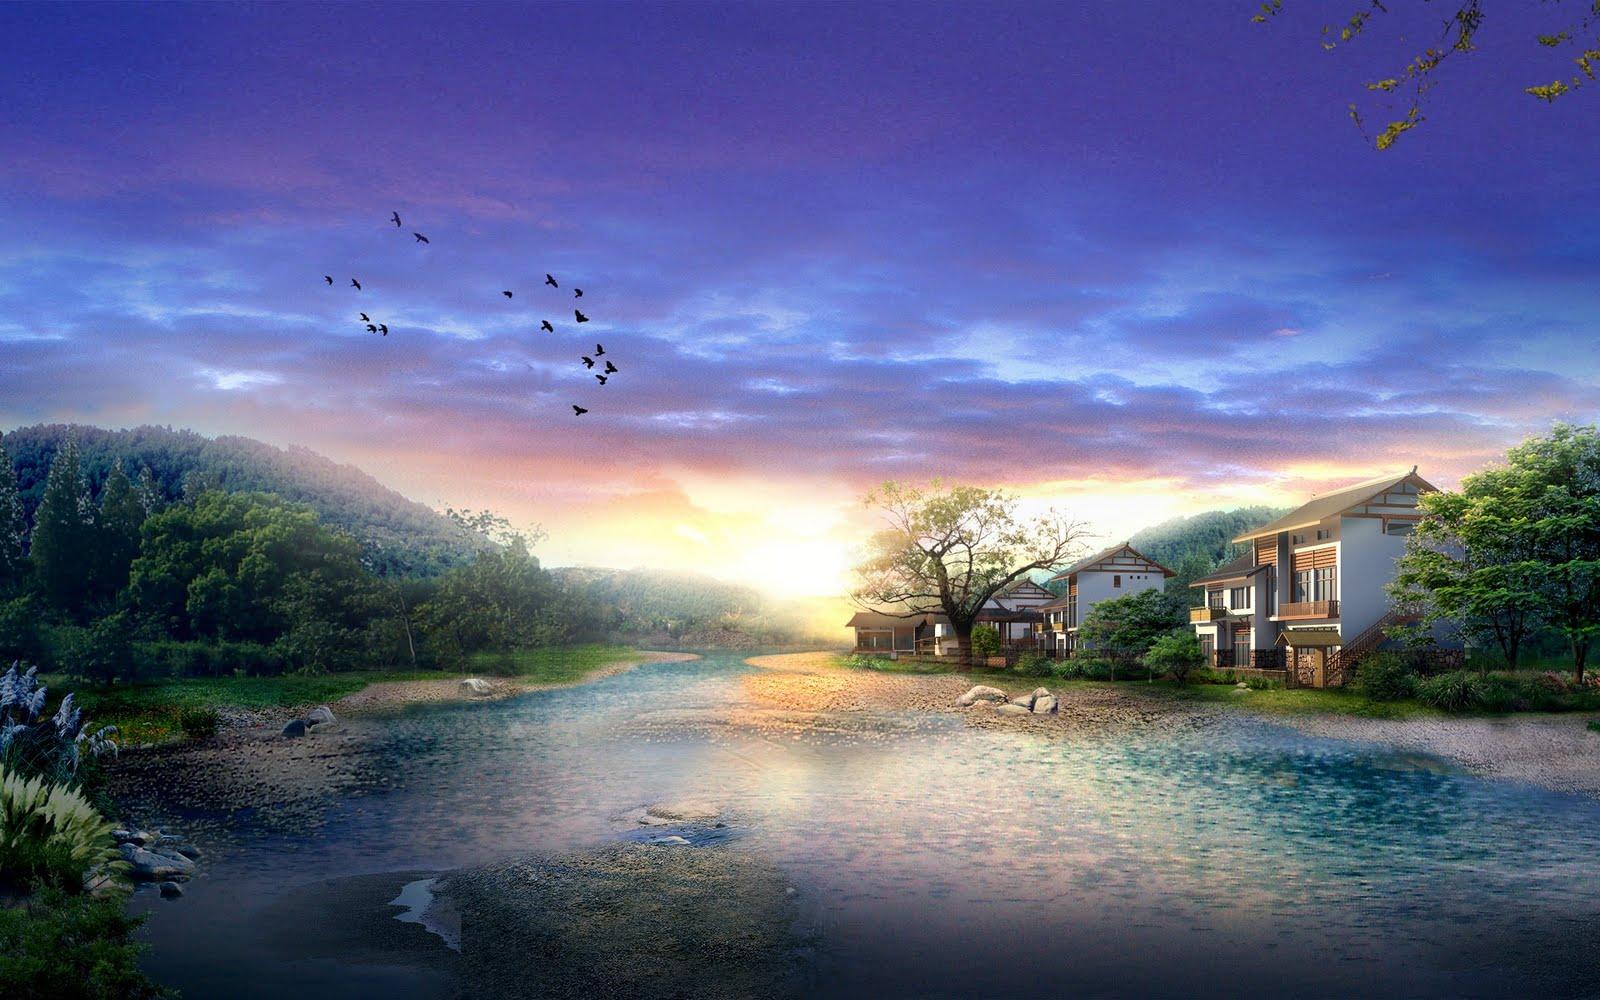 http://3.bp.blogspot.com/-CdHEUlauJPE/TtzTHUHT46I/AAAAAAAAAtE/xGyamAOavTM/s1600/sunrise-hd-8-712615.jpg